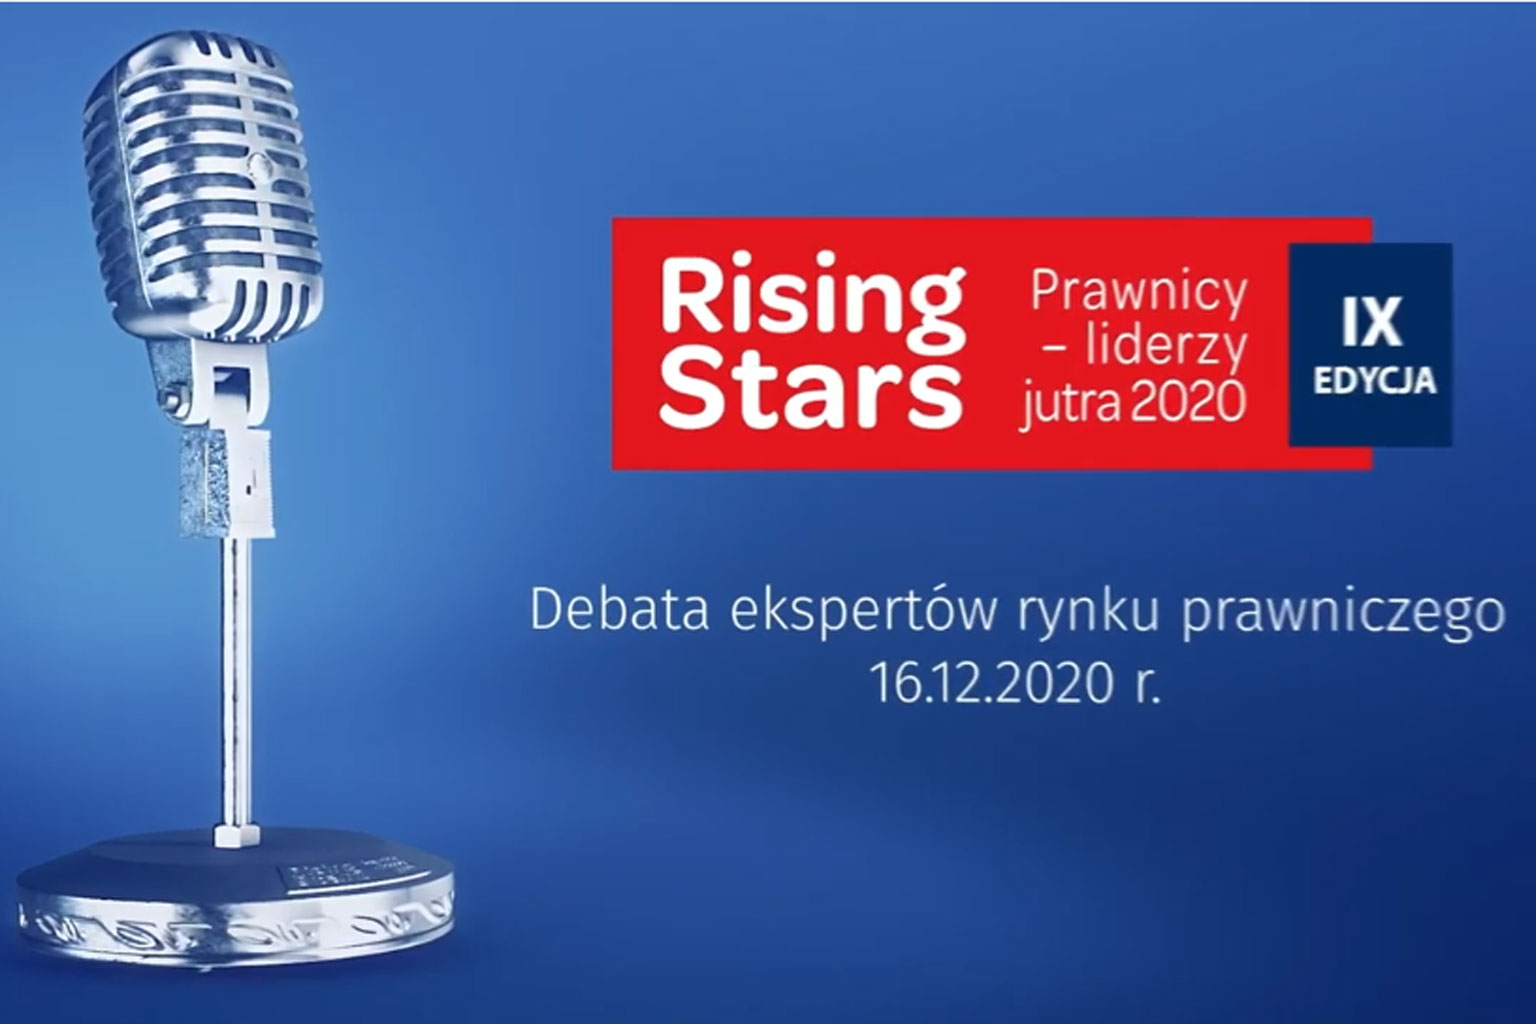 Rising Stars debata